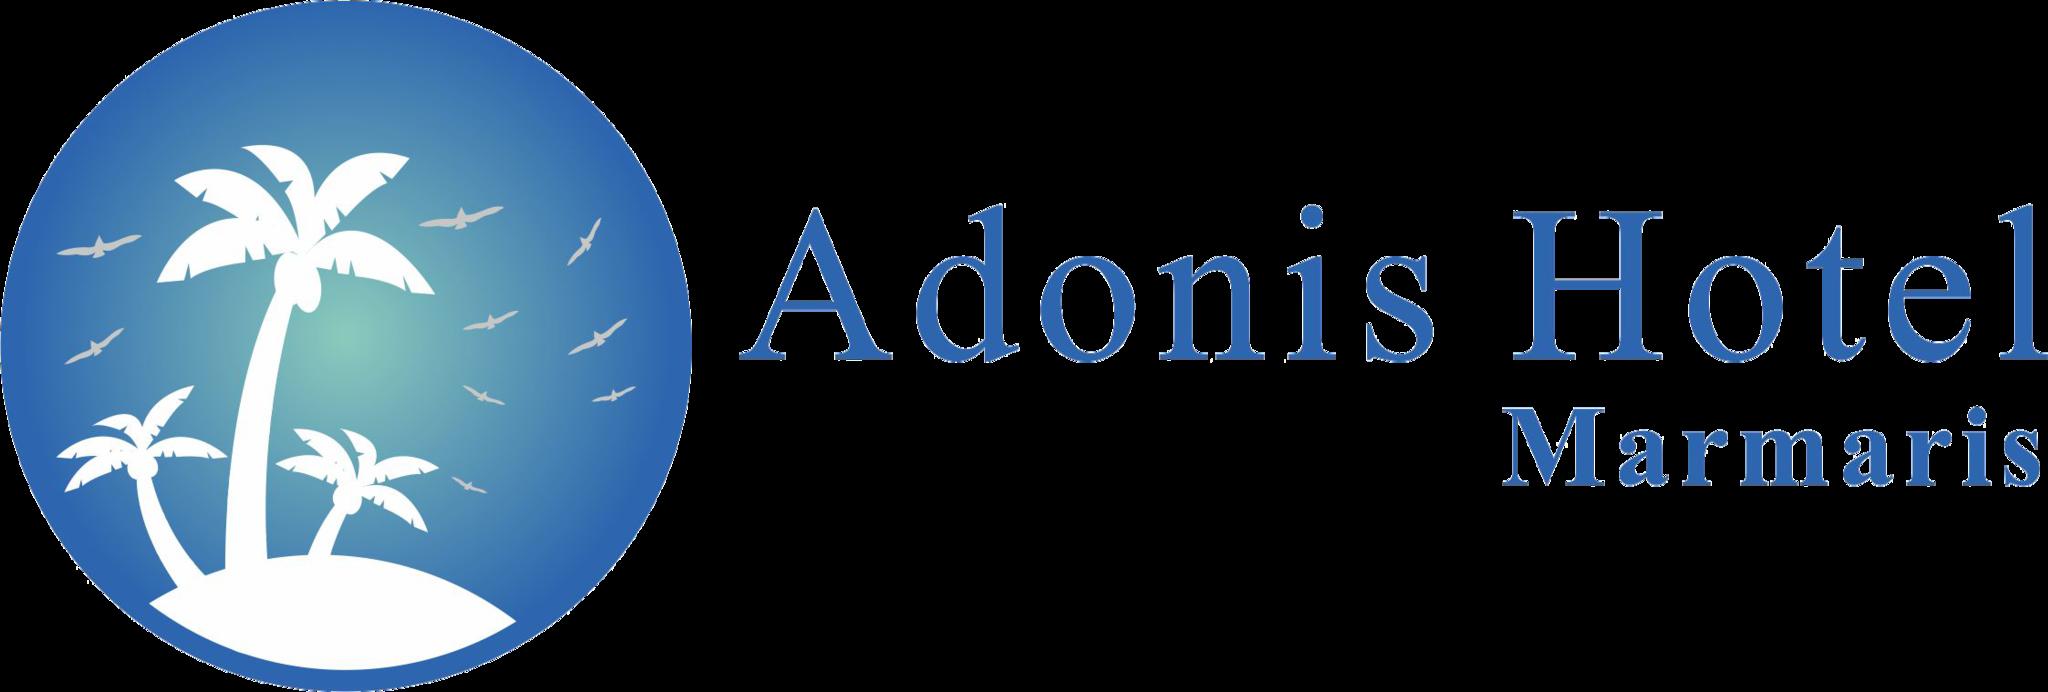 Adonis Hotel Marmaris